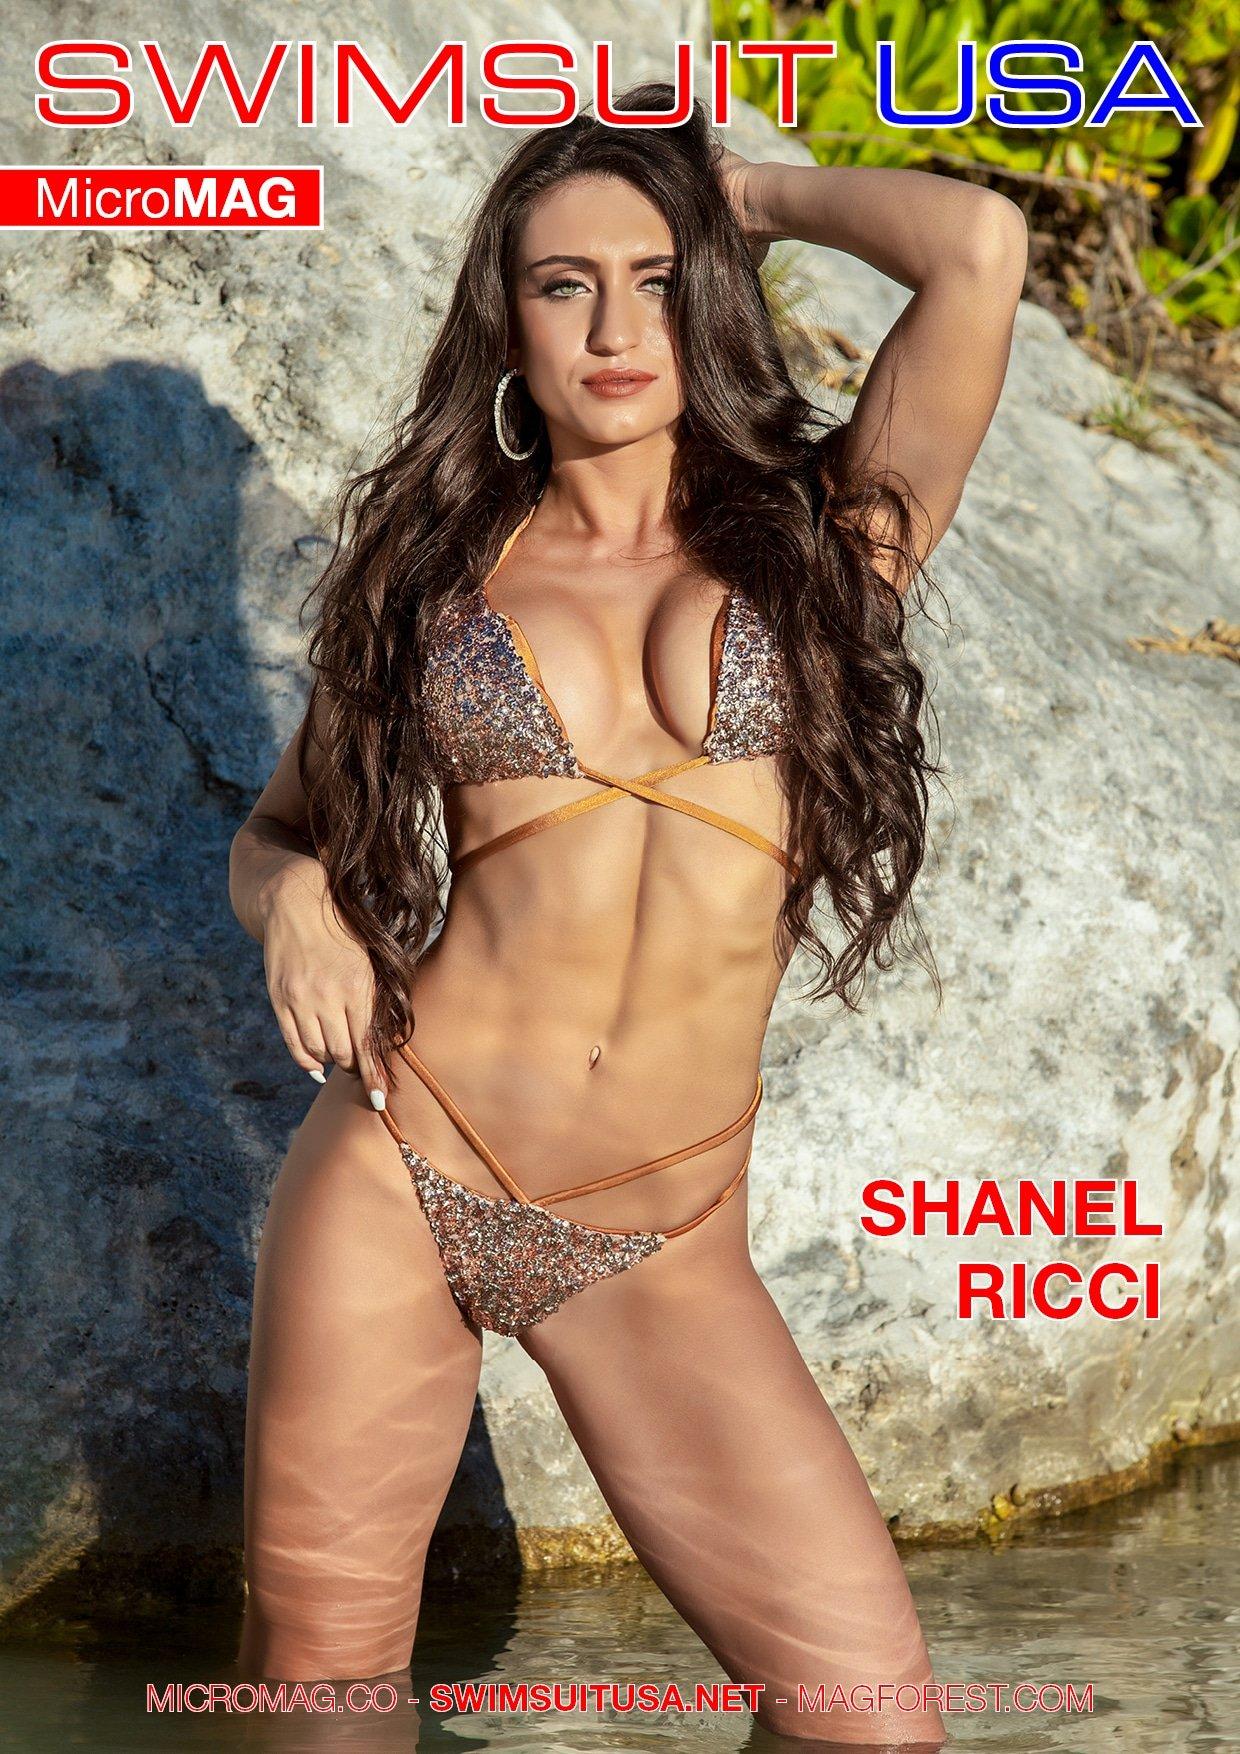 Swimsuit Usa Micromag – Shanel Ricci